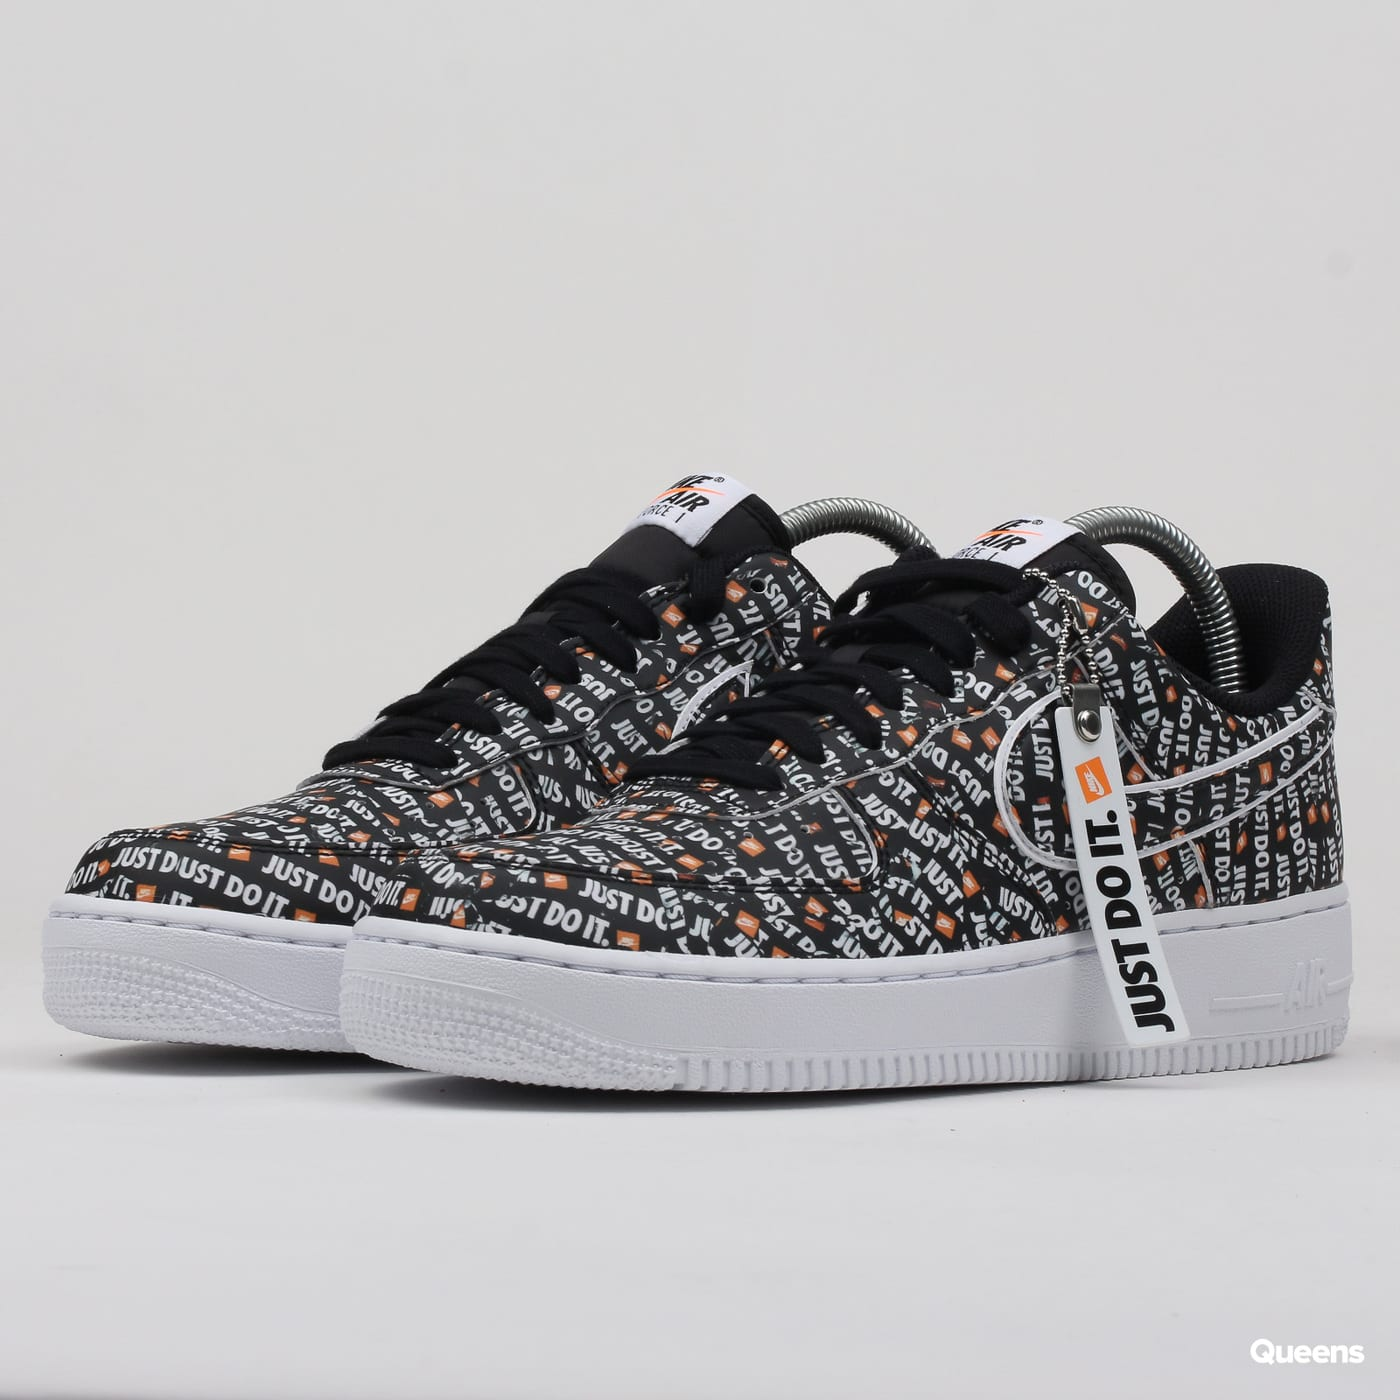 426d0431c Sneakers Nike Air Force 1 '07 LV8 JDI black / black - white - total orange ( AO6296-001) – Queens 💚